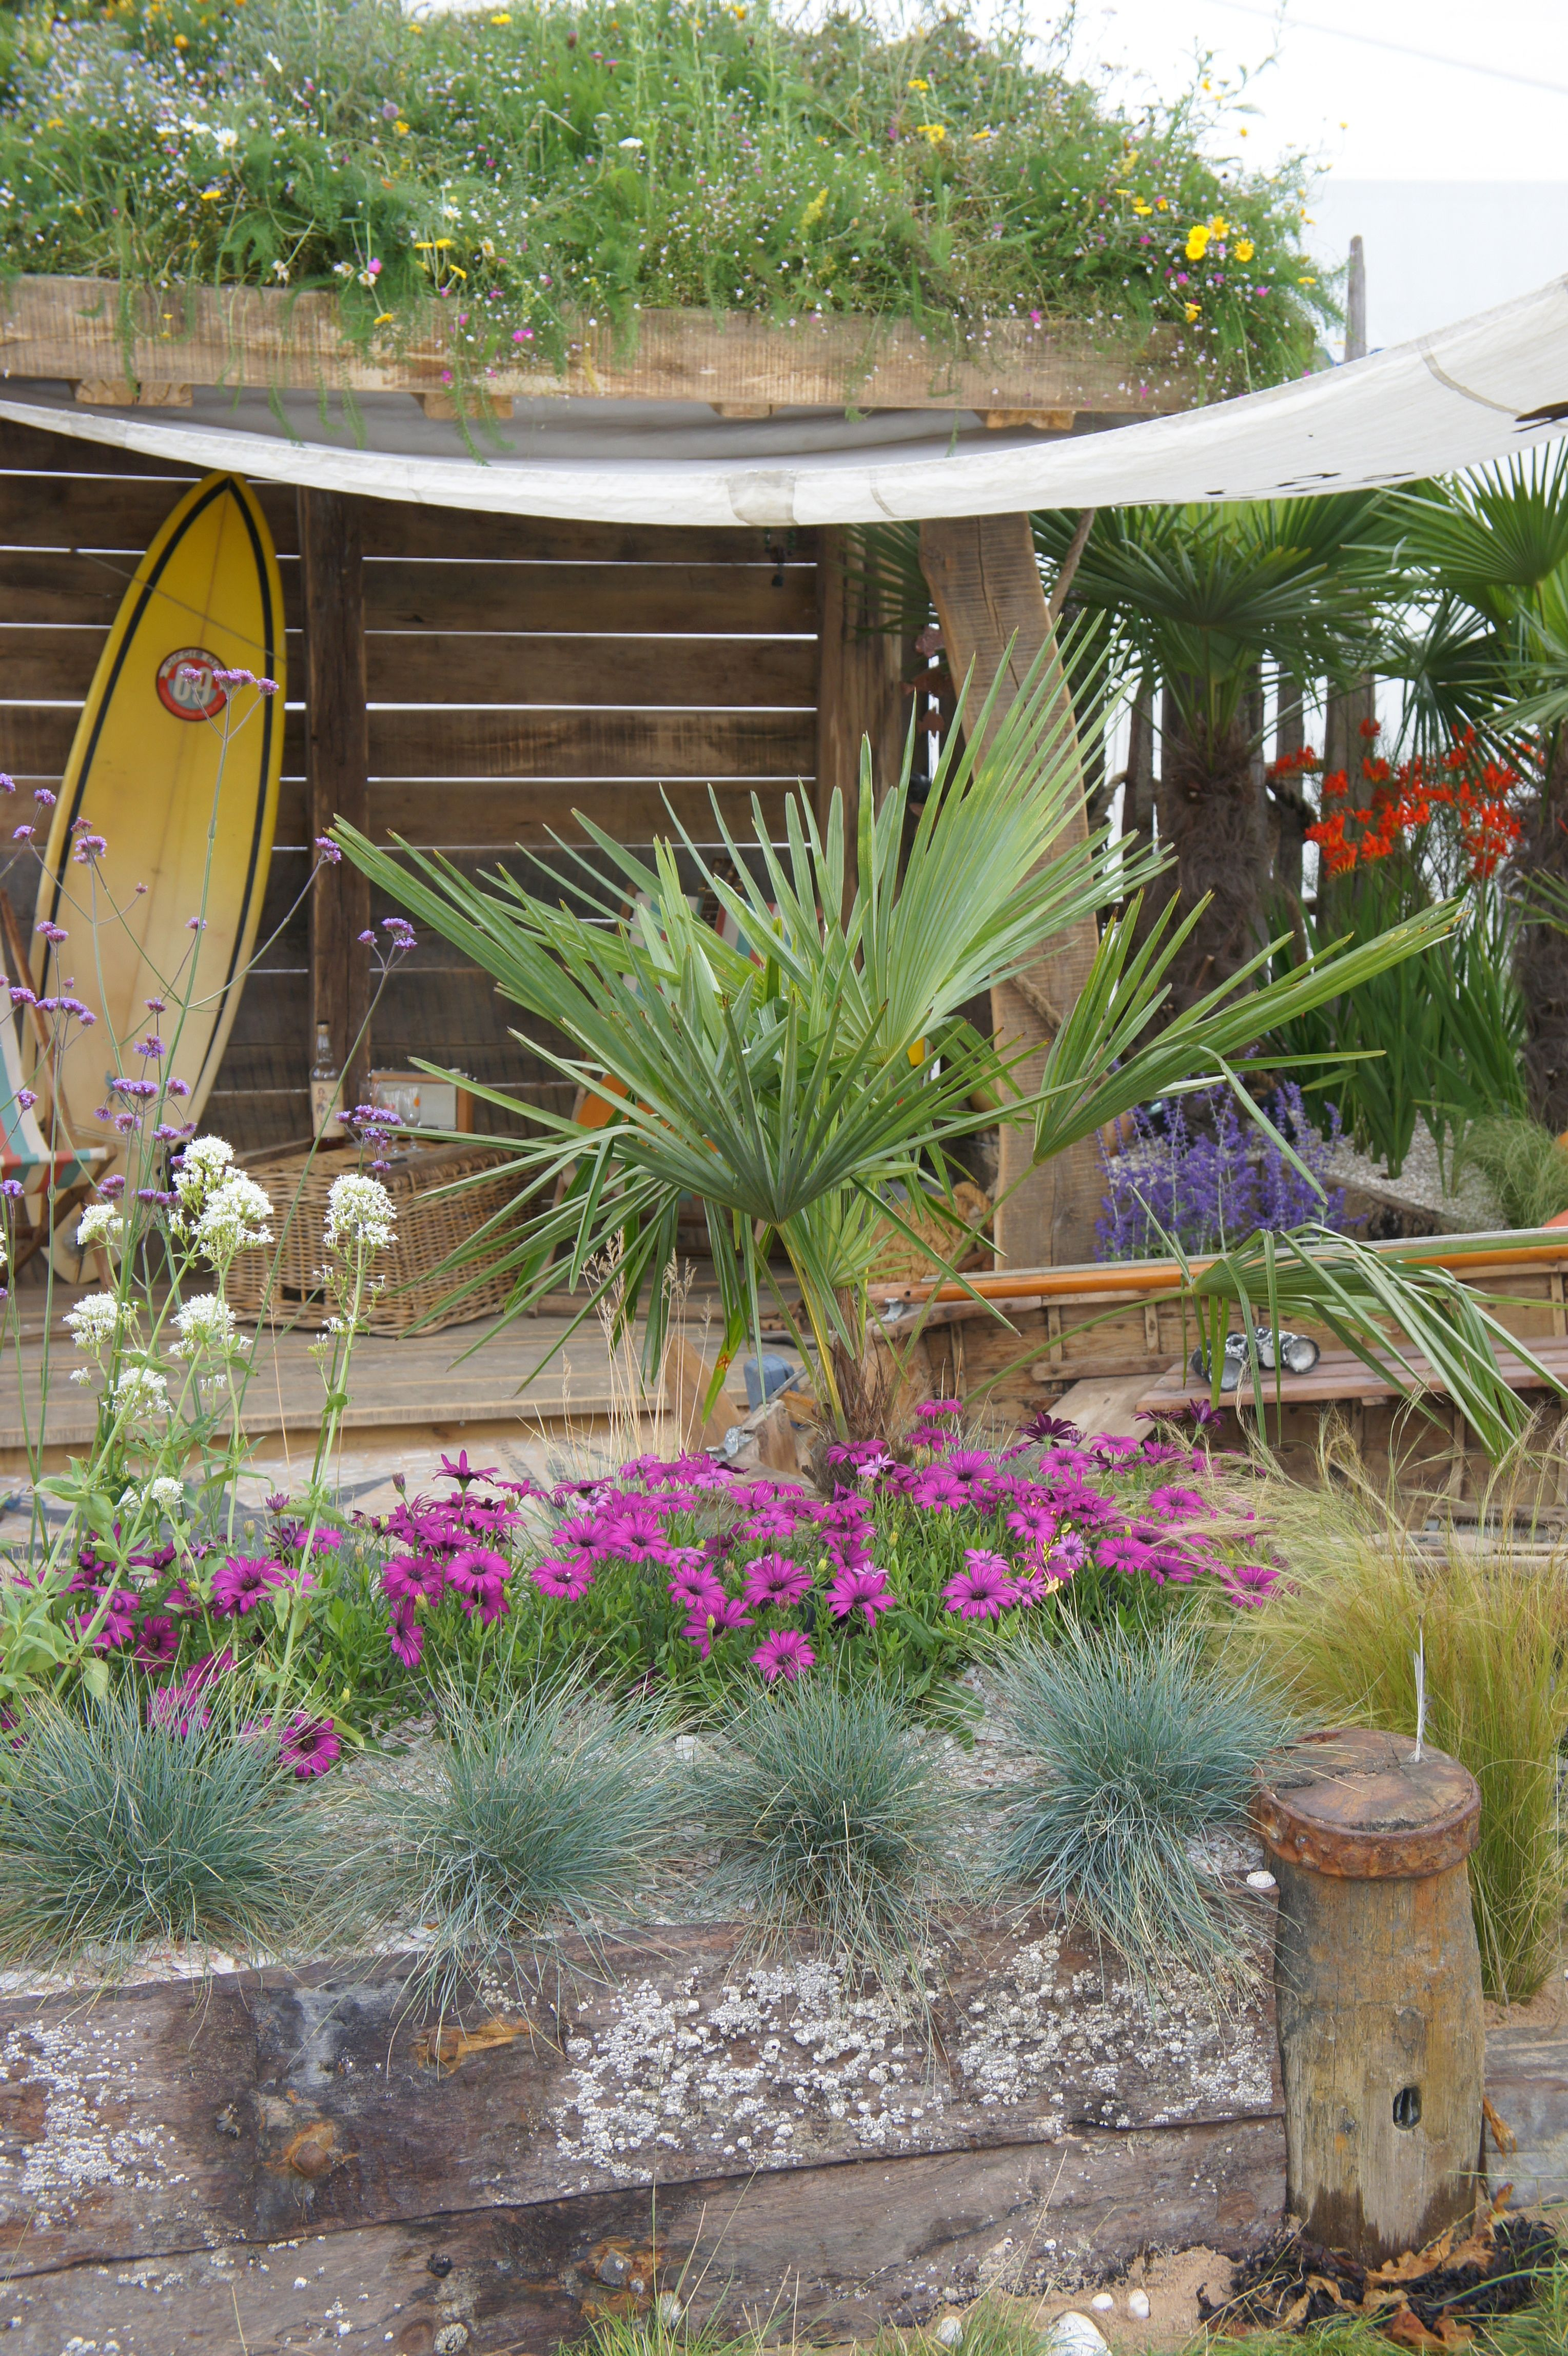 Seaside garden for Severndale Specialist School   Beaches ...